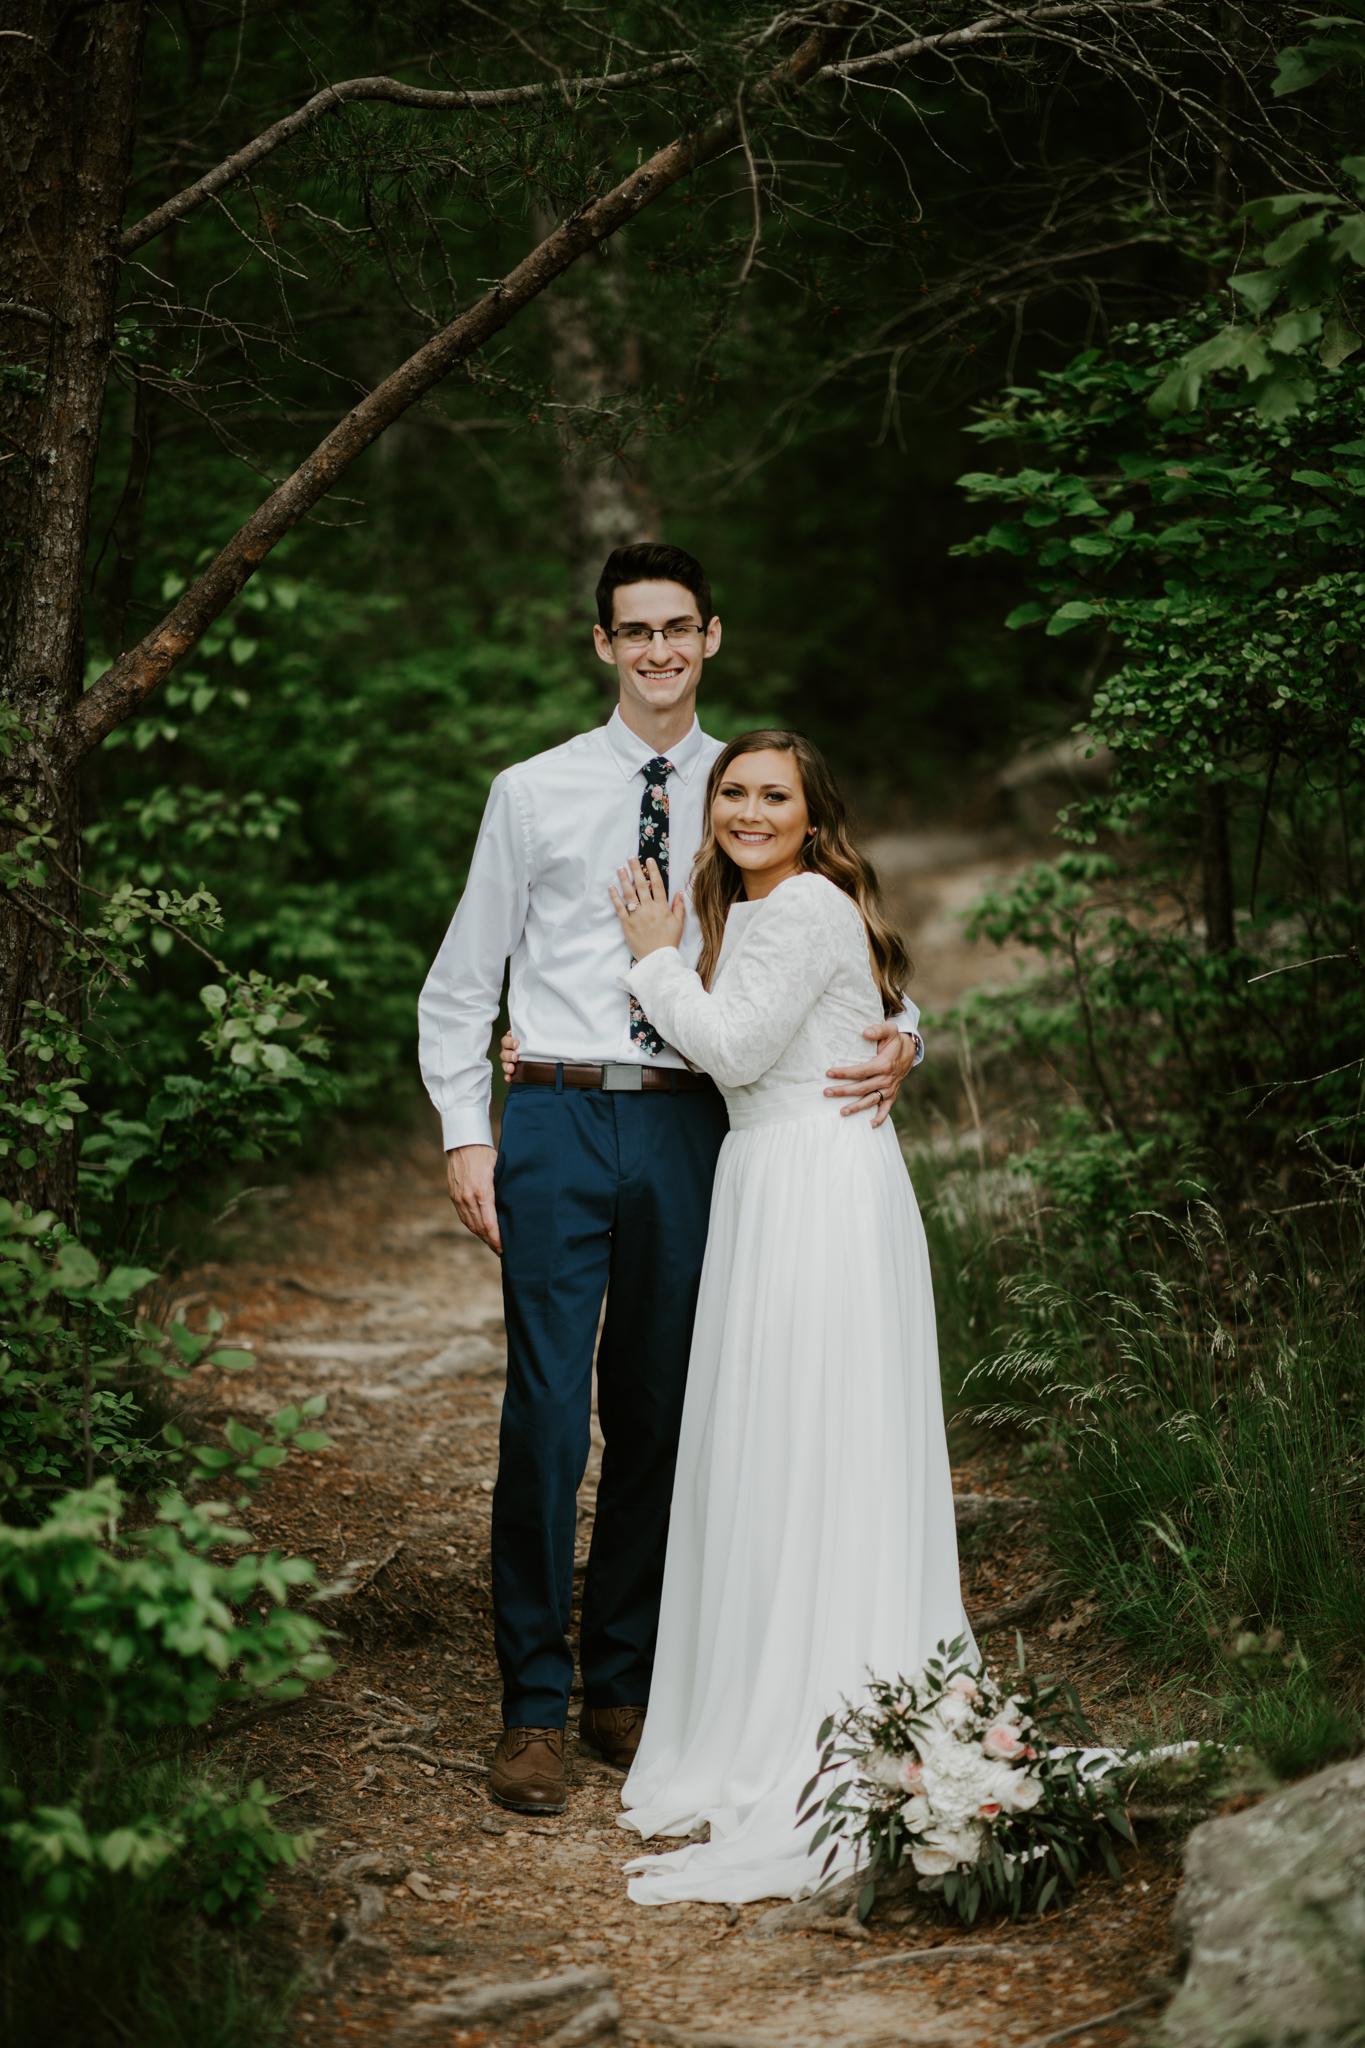 Lacey-Joe-Chattanooga-Nashville-Tennessee-Wedding-Elopement-Photographer-142.jpg